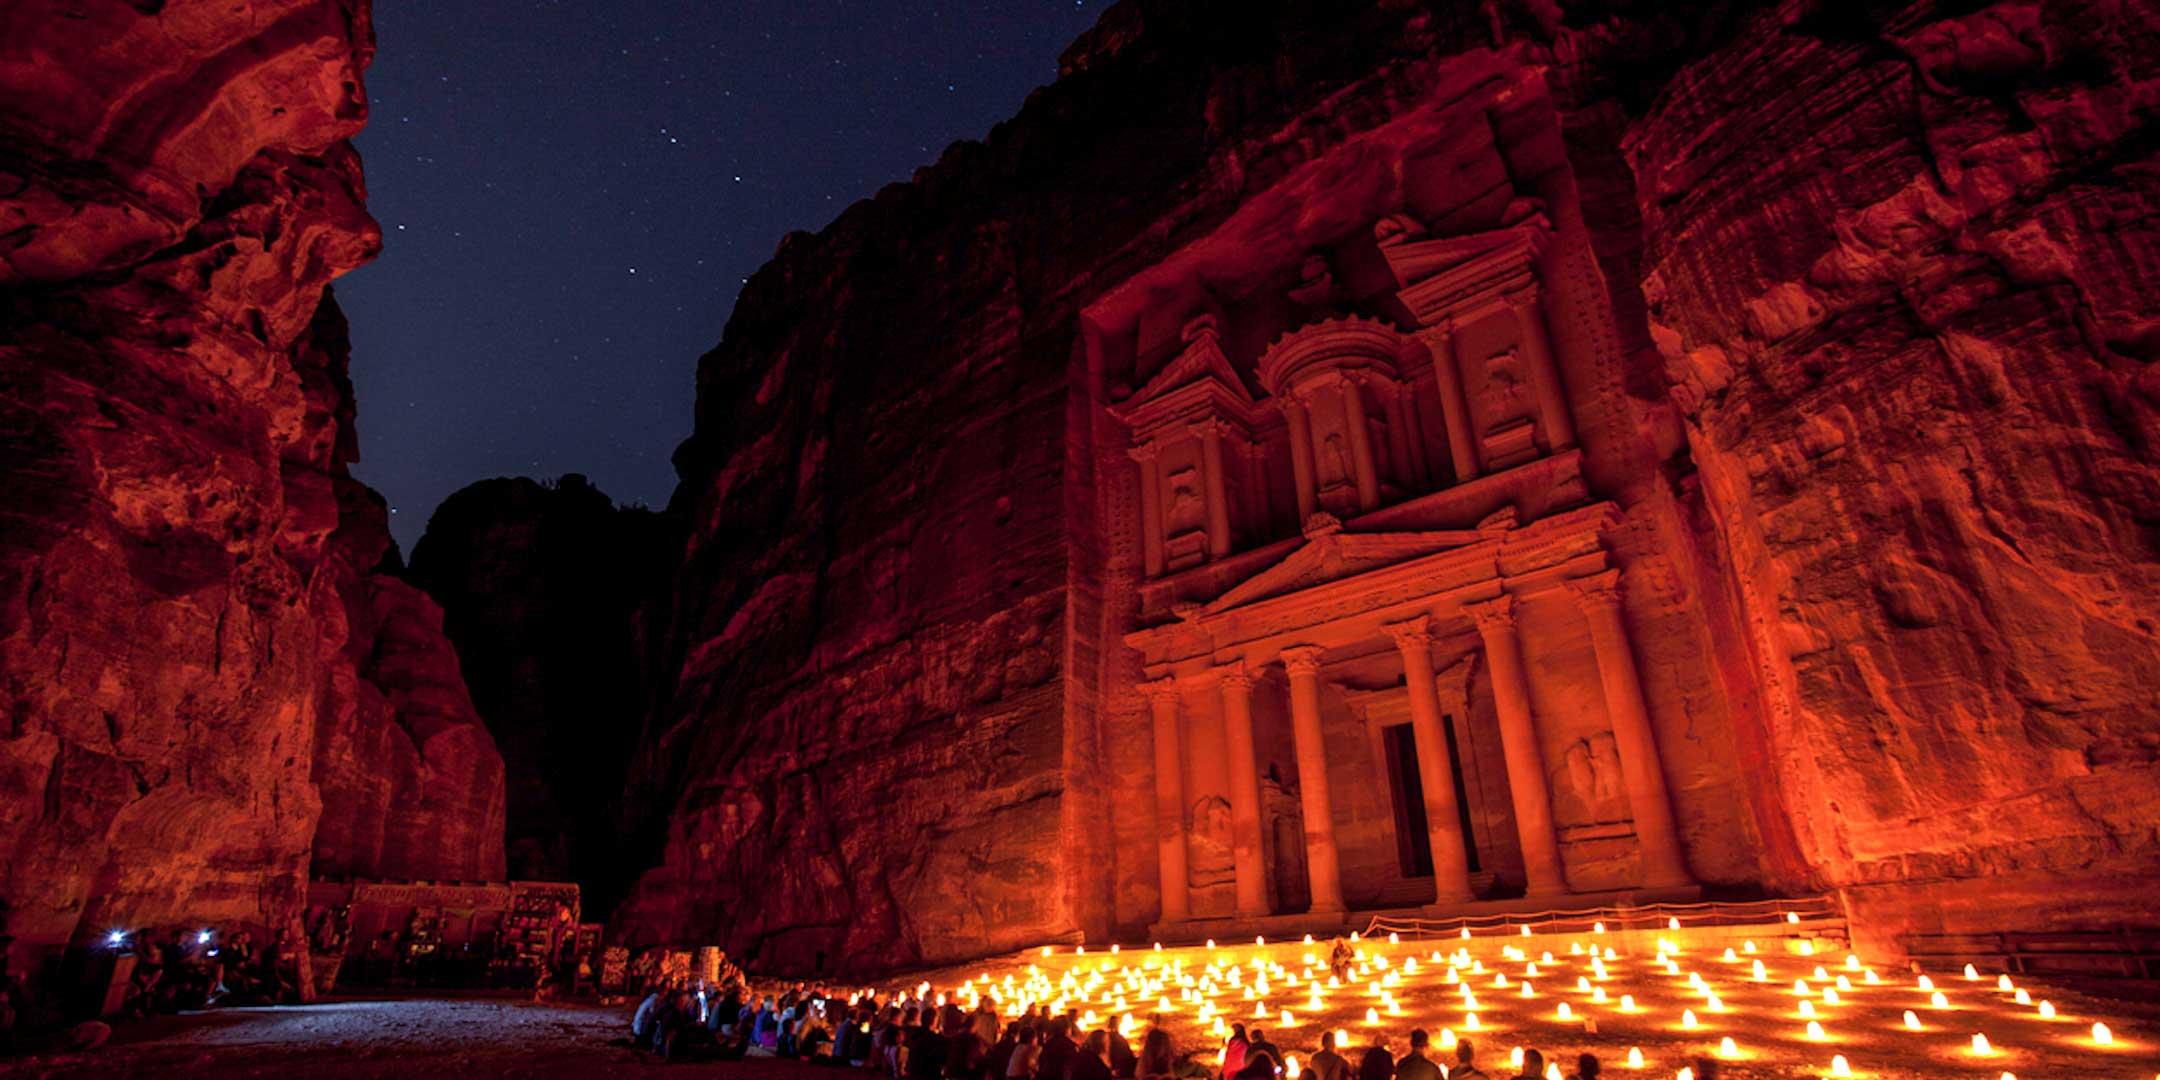 7-days-in-jordan-itinerary-guide-